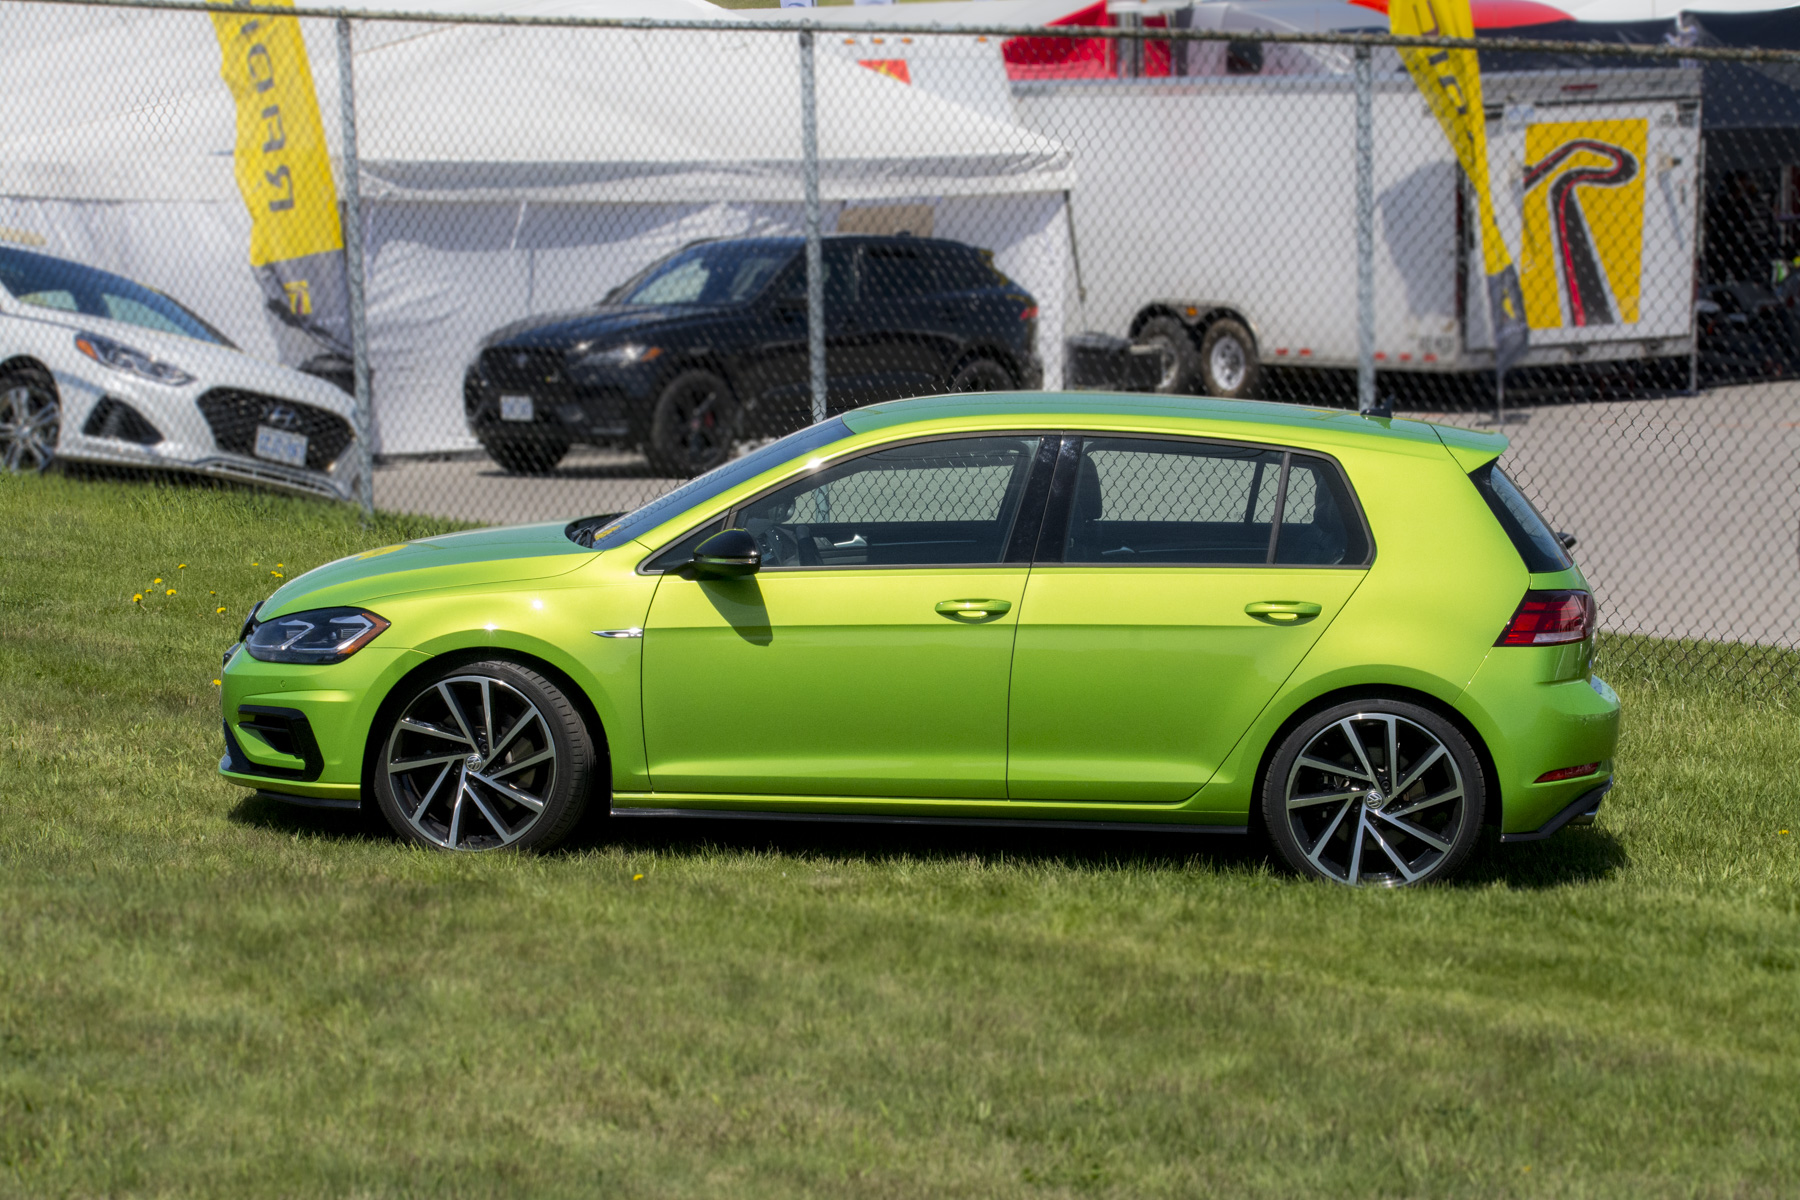 2018 Volkswagen Golf R (52)